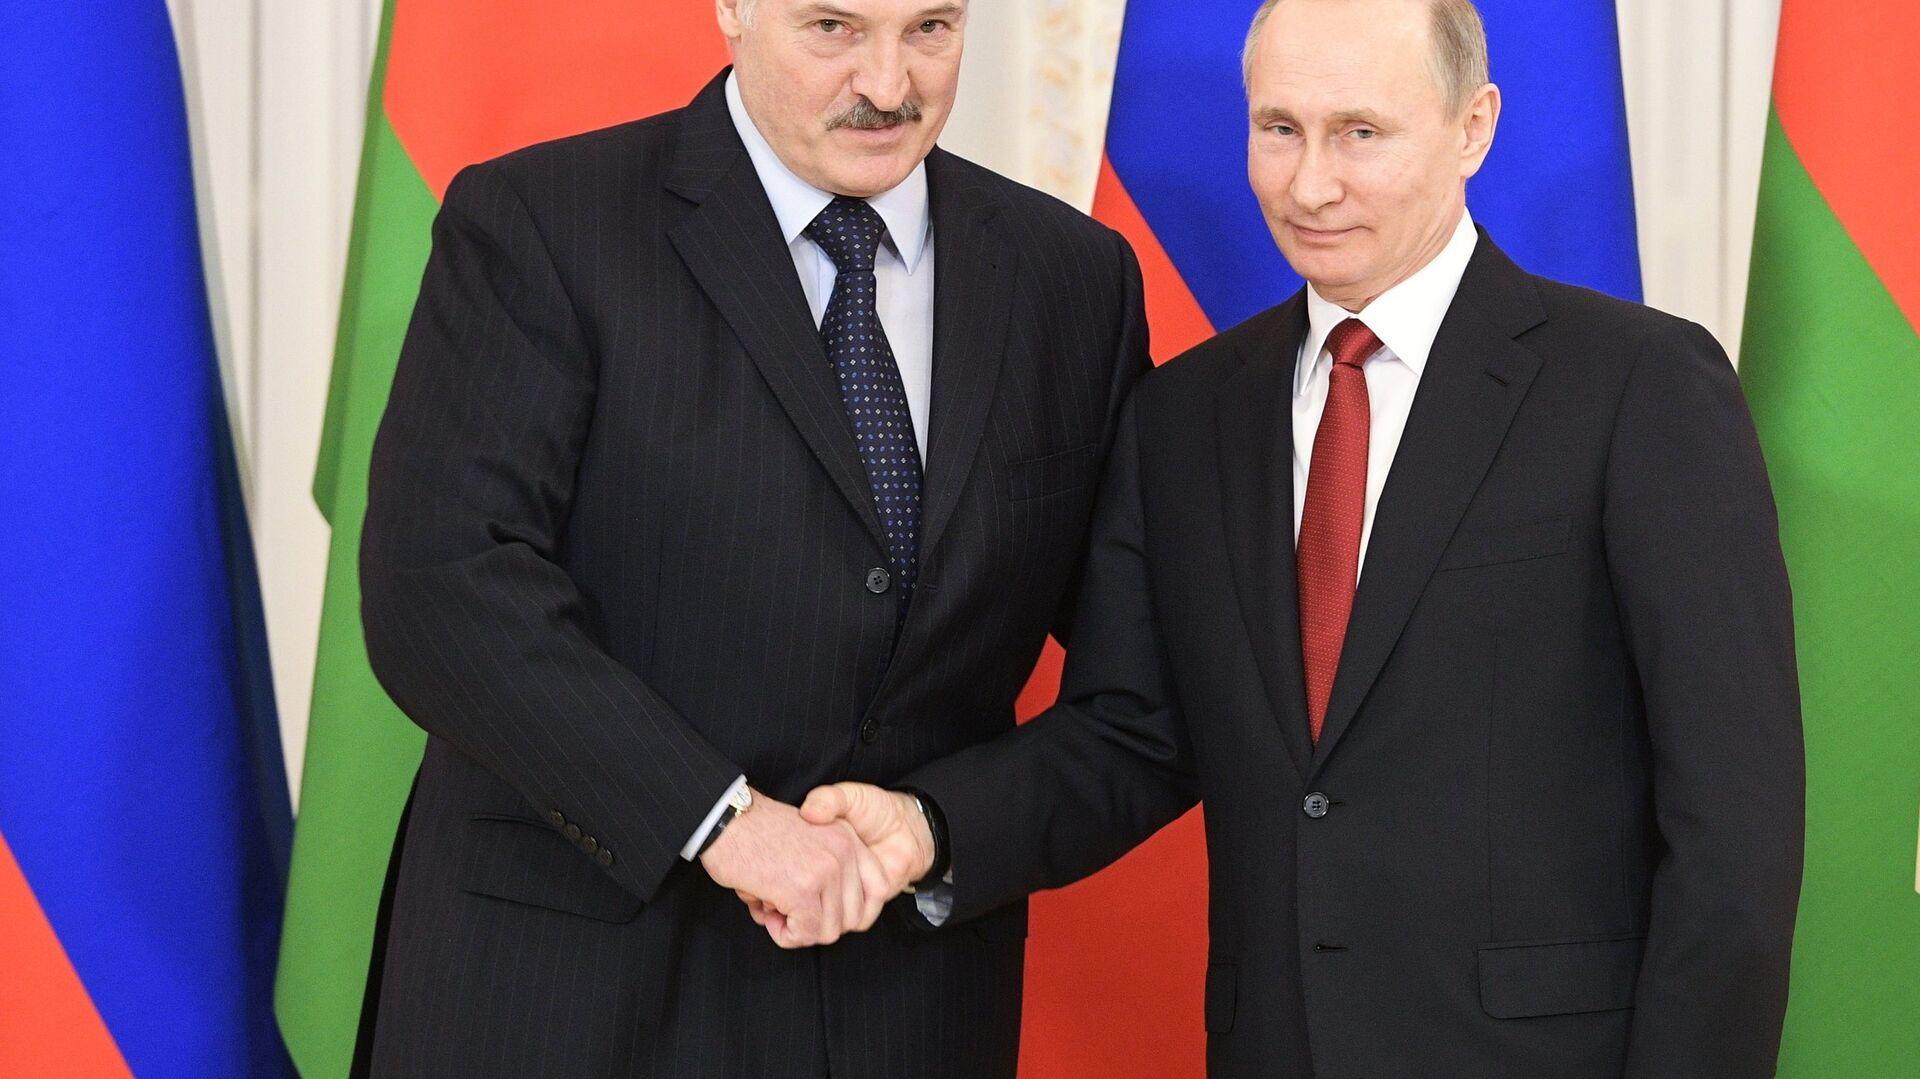 Vladimir Putin e Alexander Lukashenko - Sputnik Italia, 1920, 10.09.2021